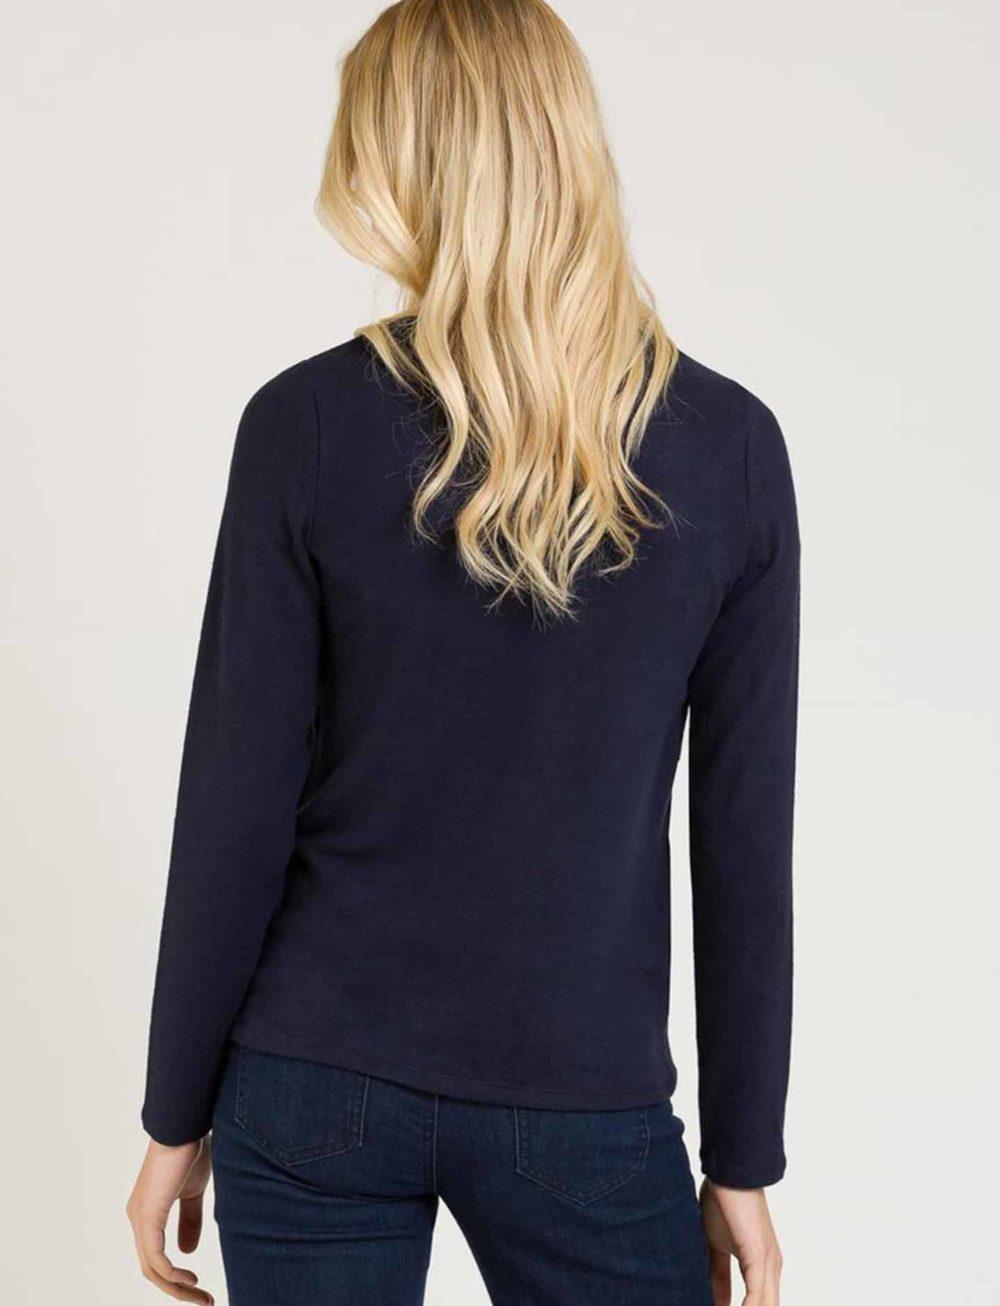 camiseta-combinada-transparencias-azul-marino-espalda